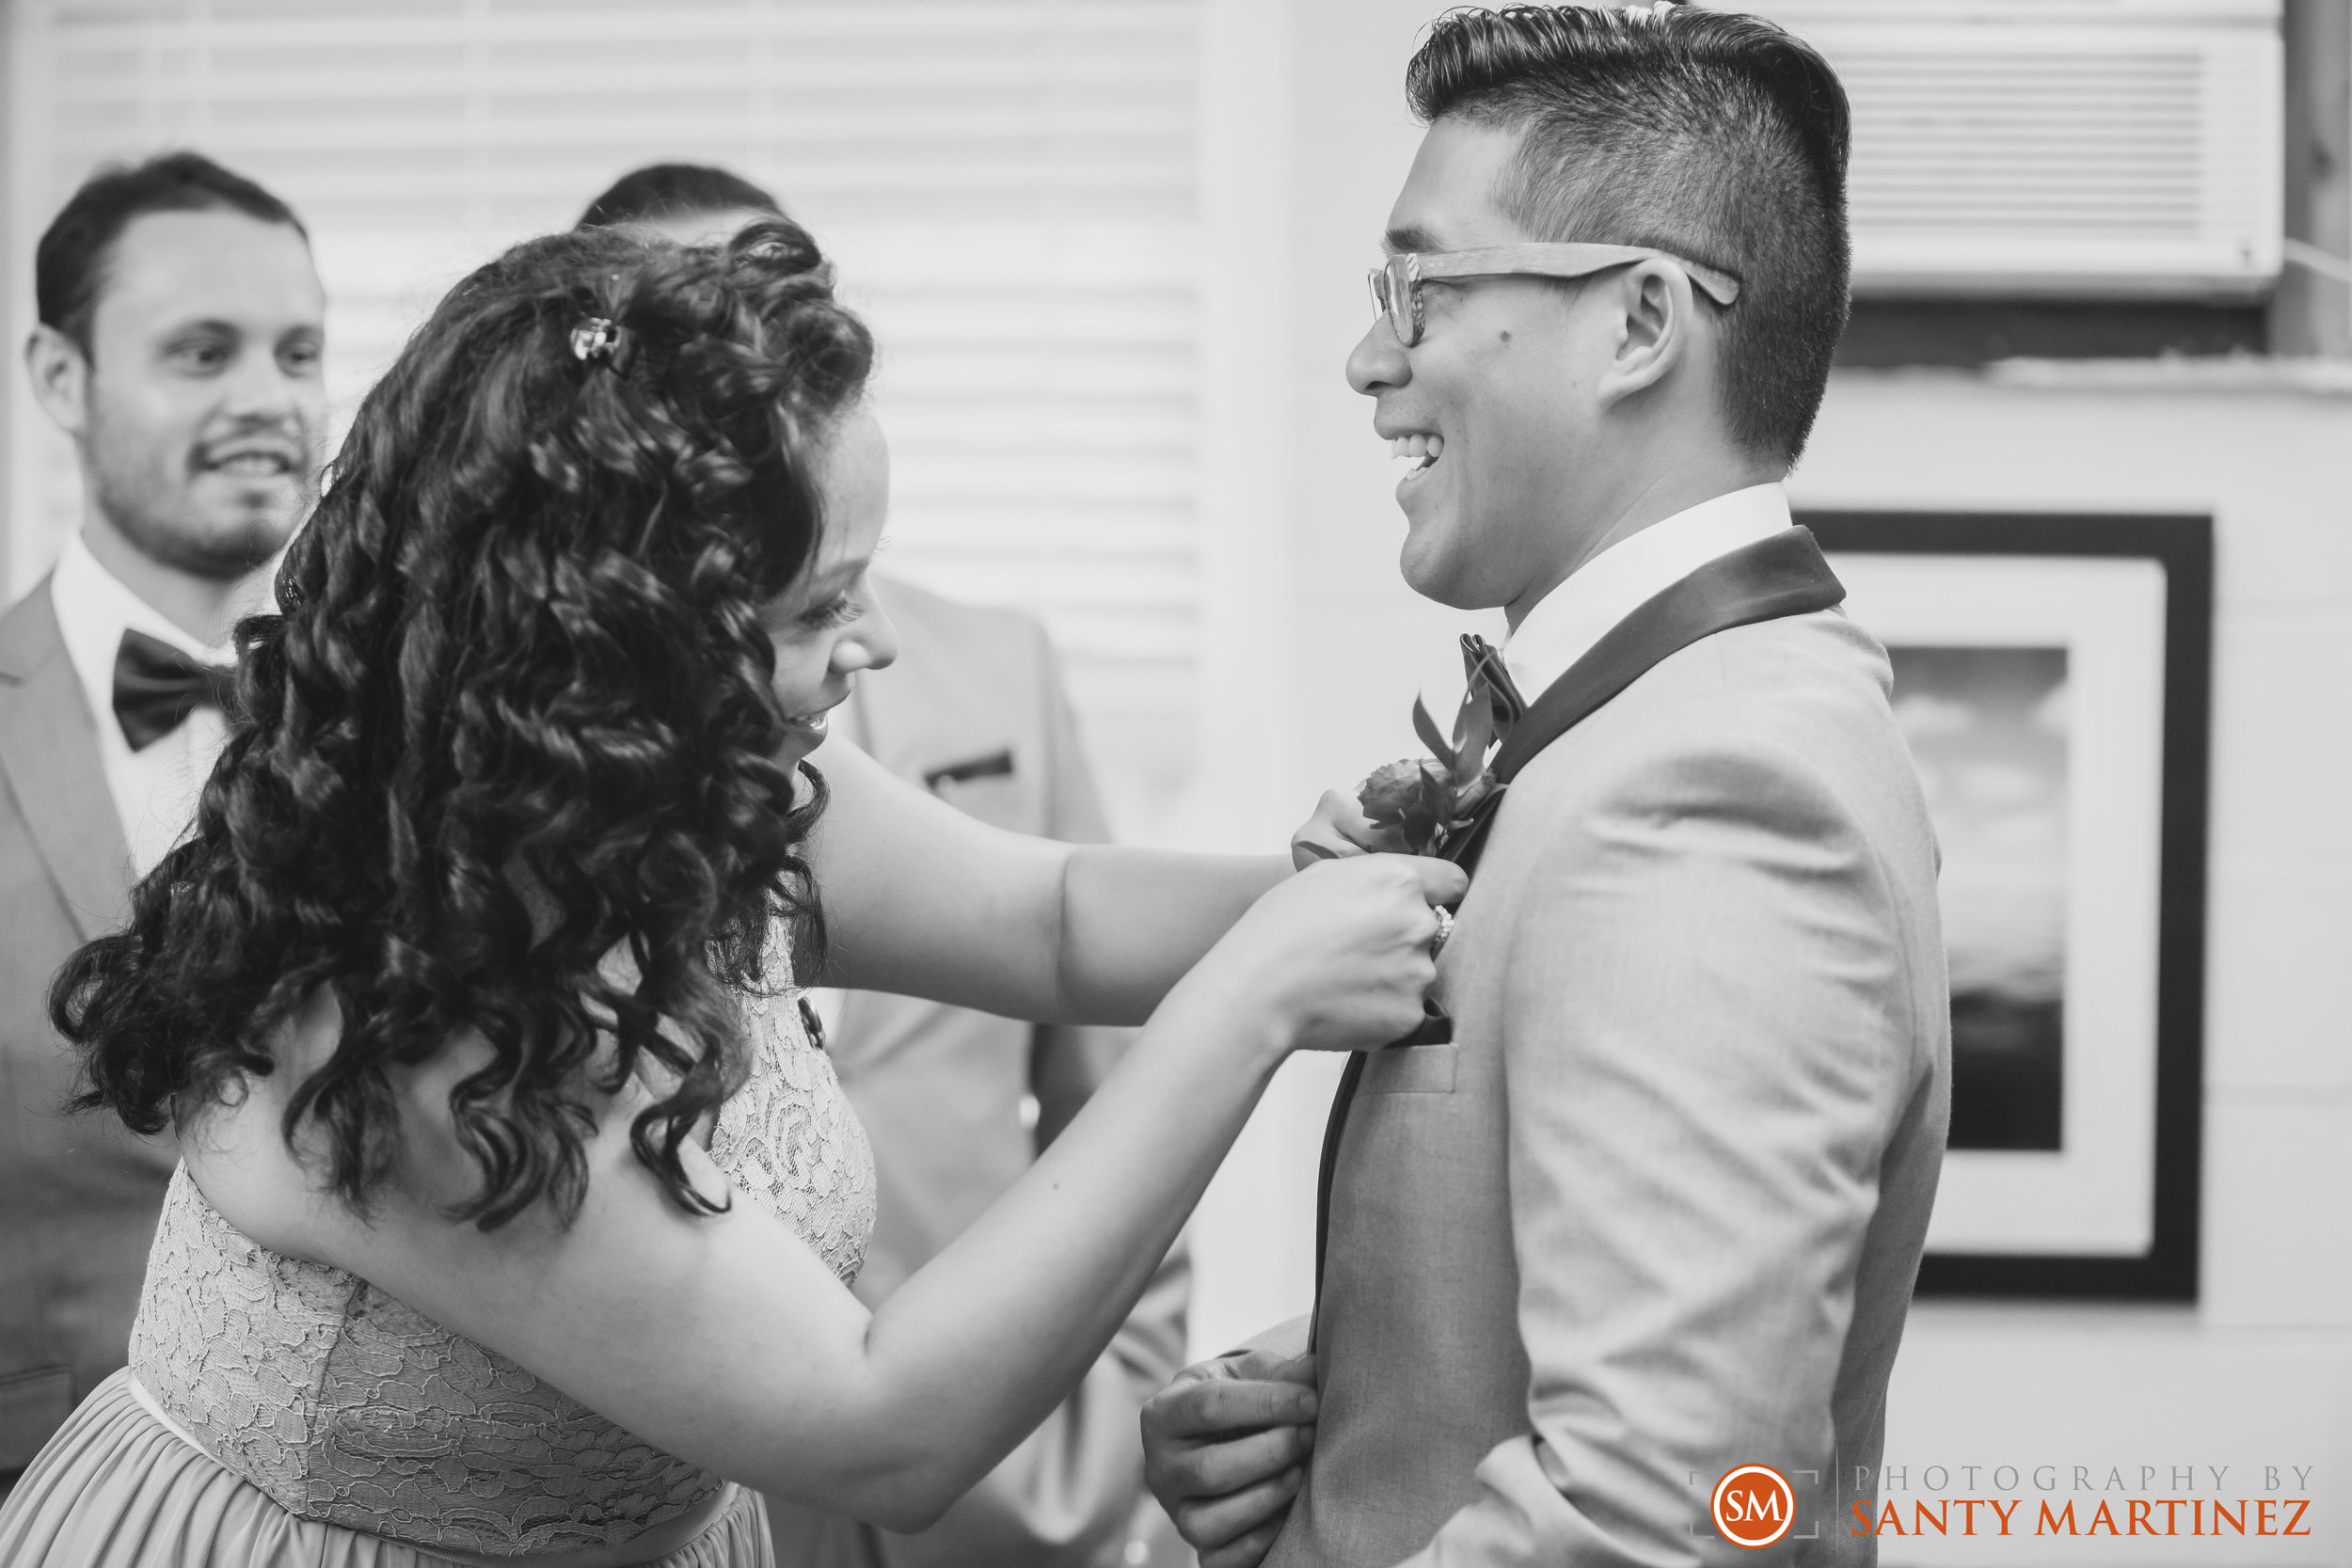 Wedding Bonnet House - Photography by Santy Martinez-1-3.jpg